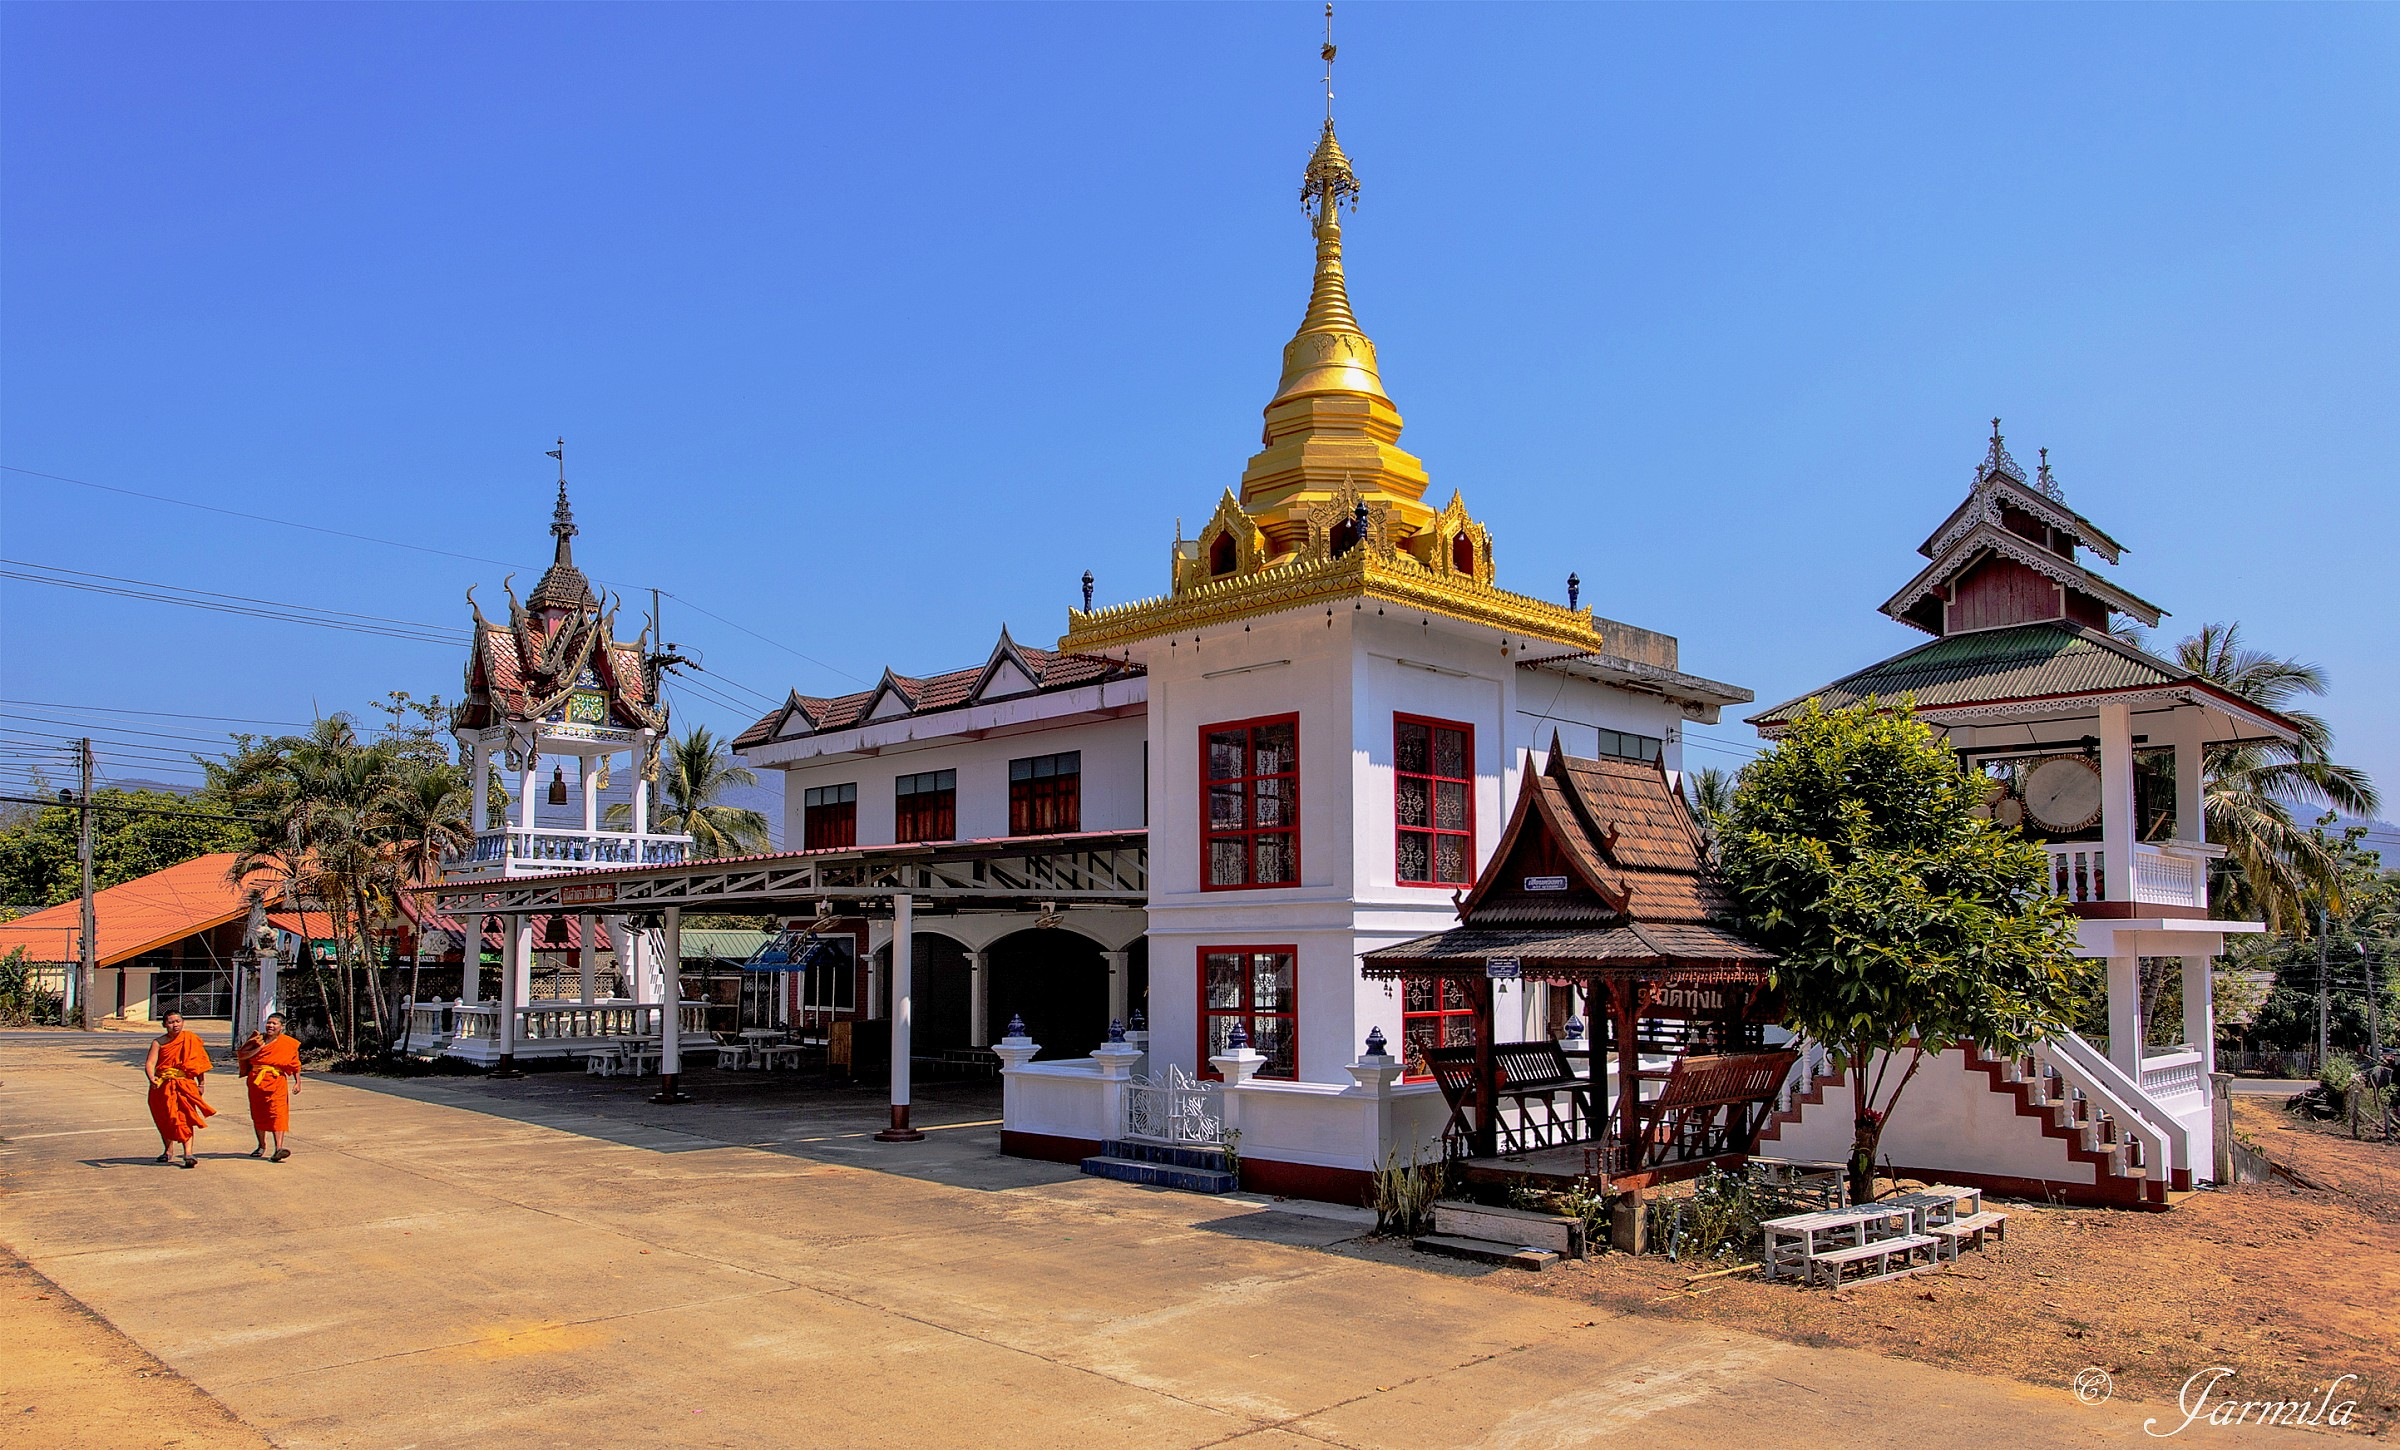 I monaci nel tempio buddista...